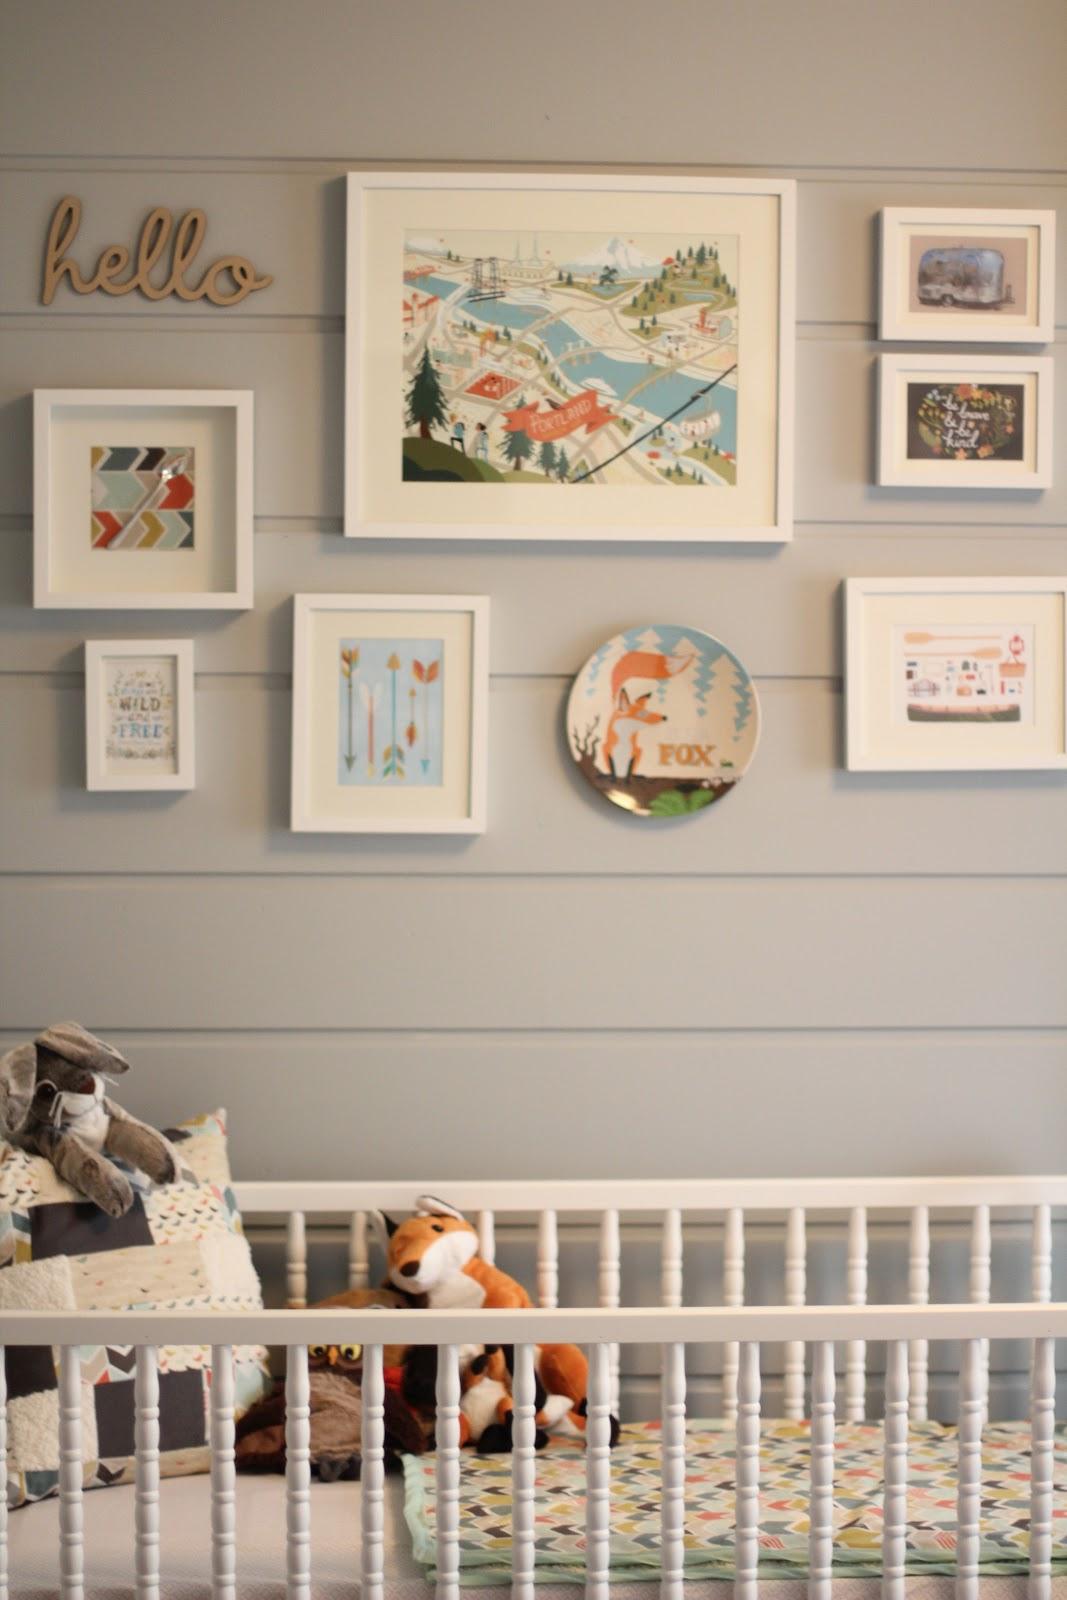 Fox nursery room : Baby fox nursery theme